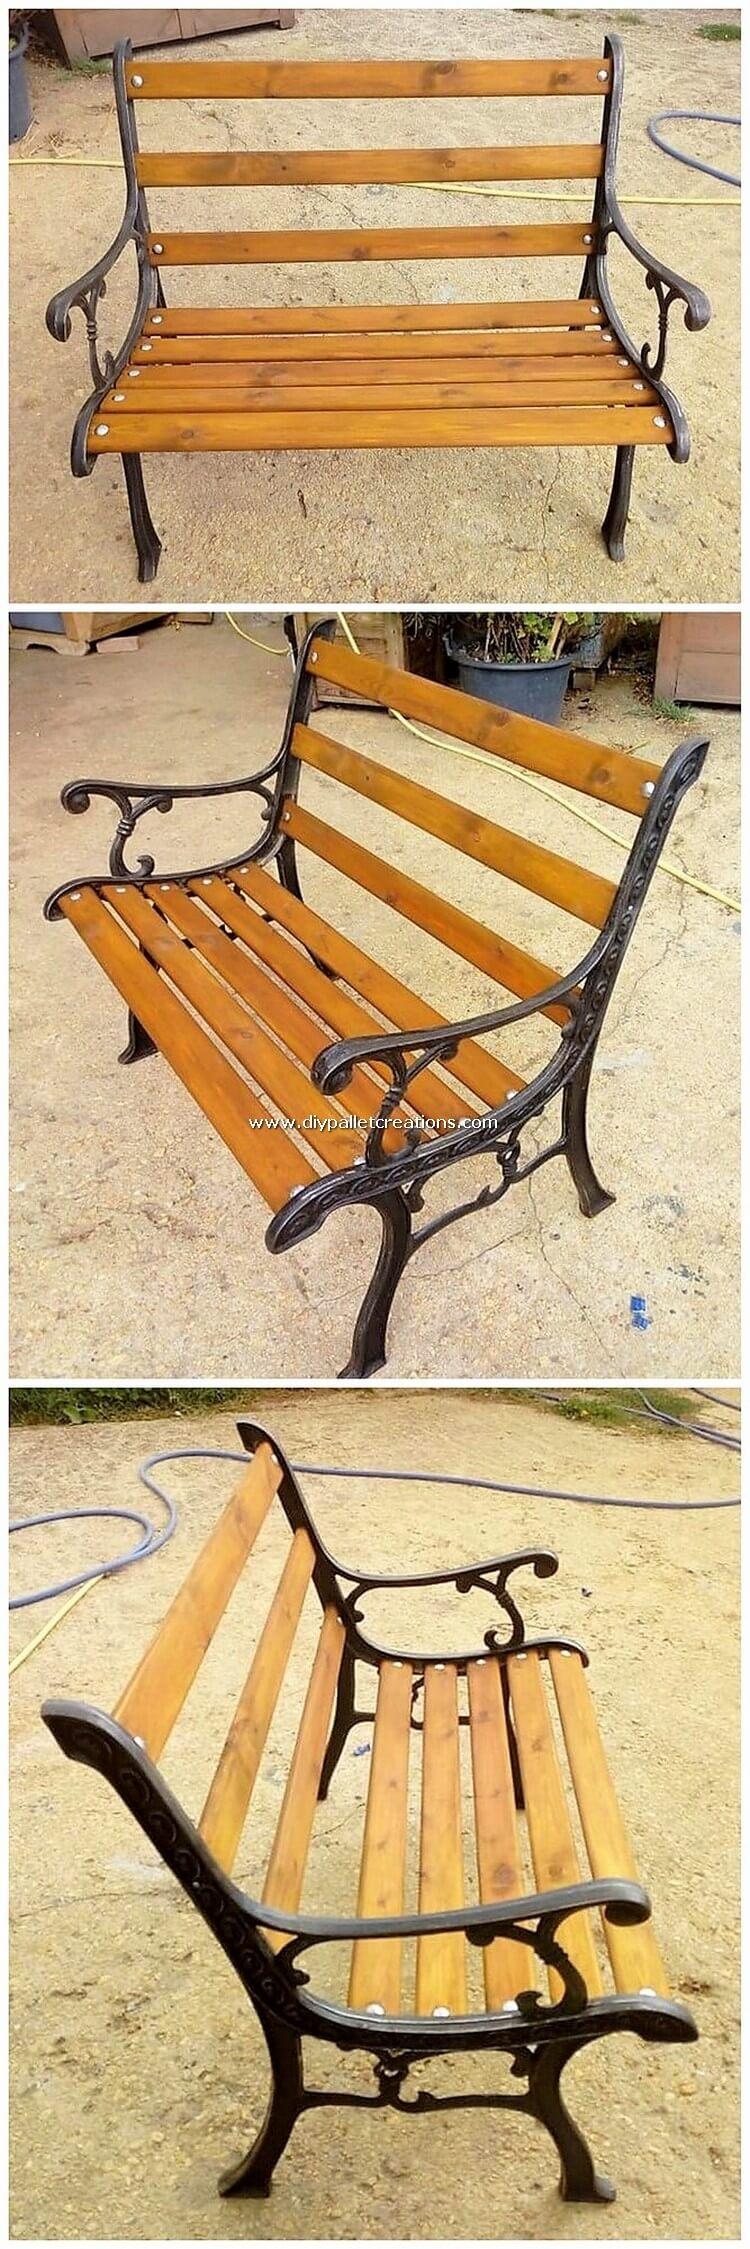 Pallet Wooden Bench